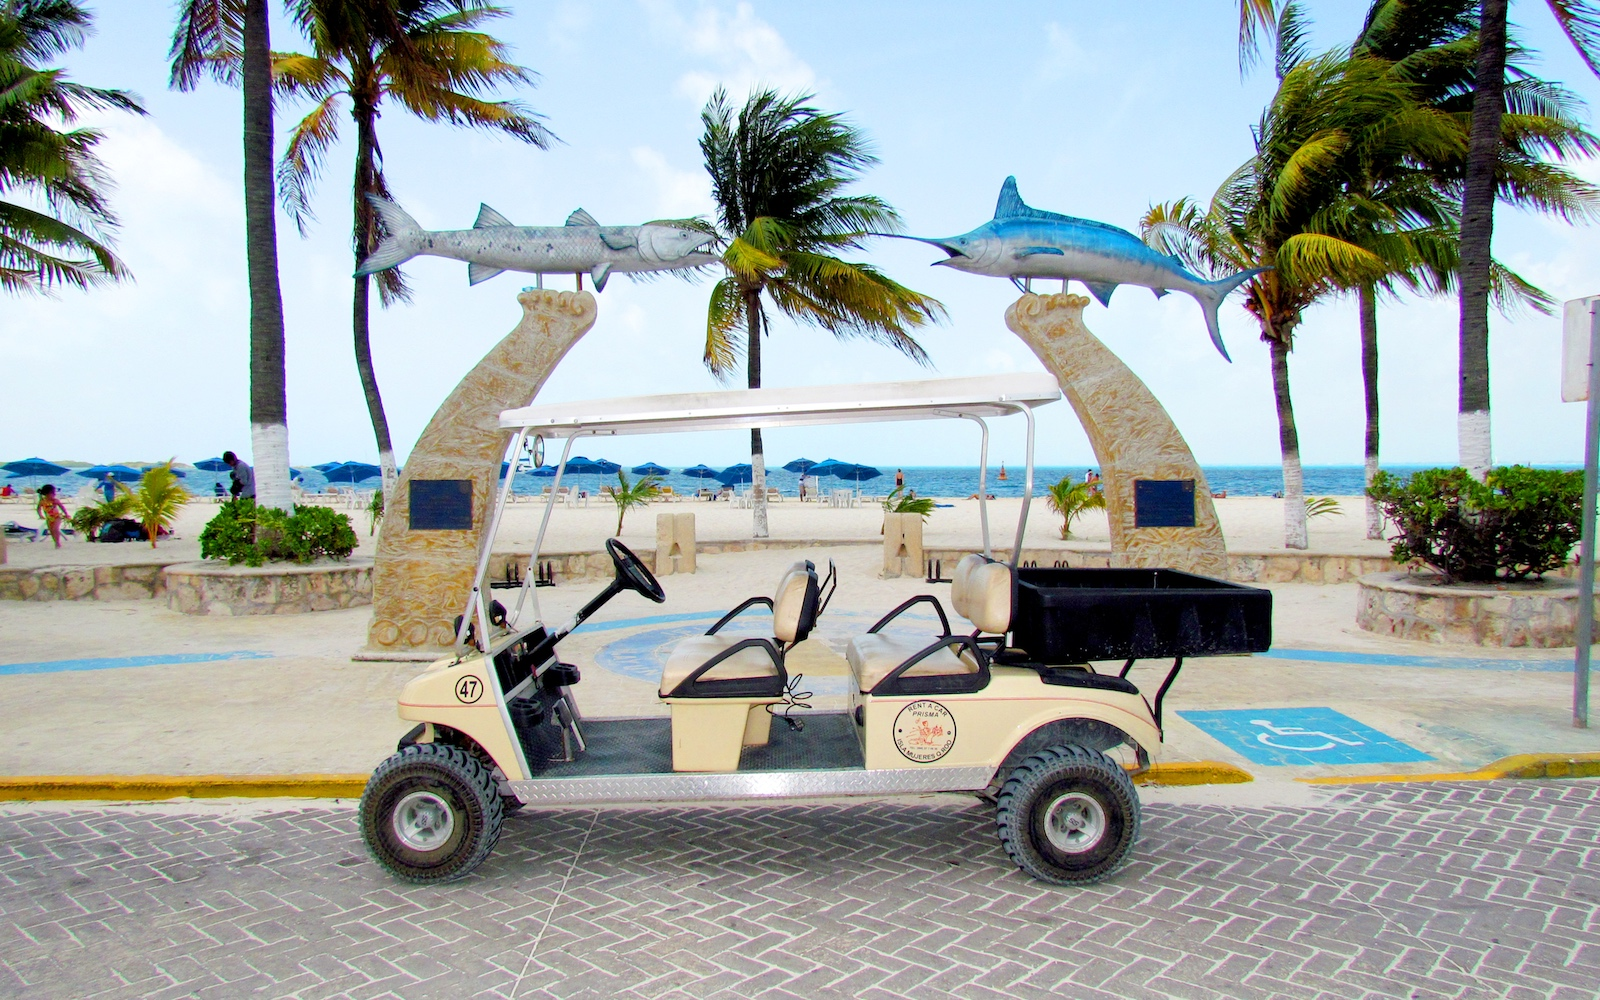 Isla-Mujeres-Golf-Cart-Rentals